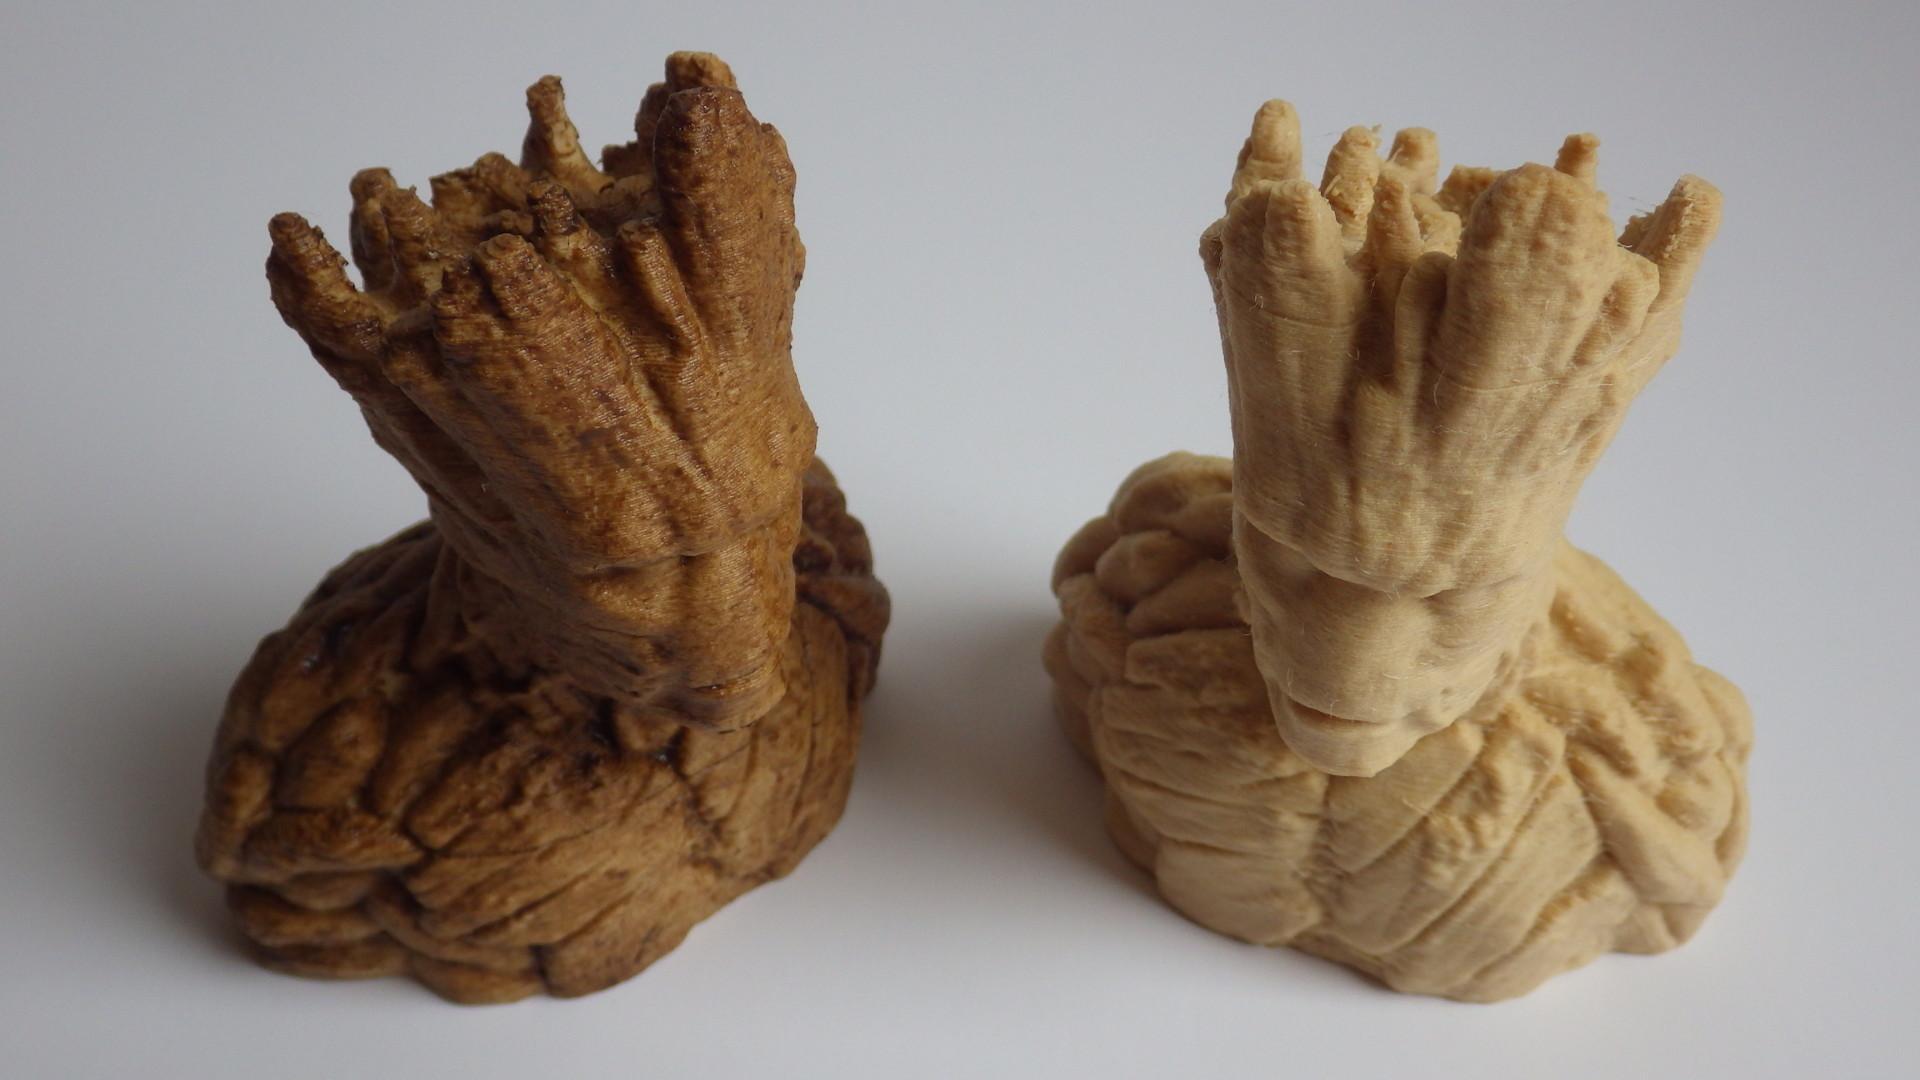 wood filament review 3d printing materials feels smells like wood